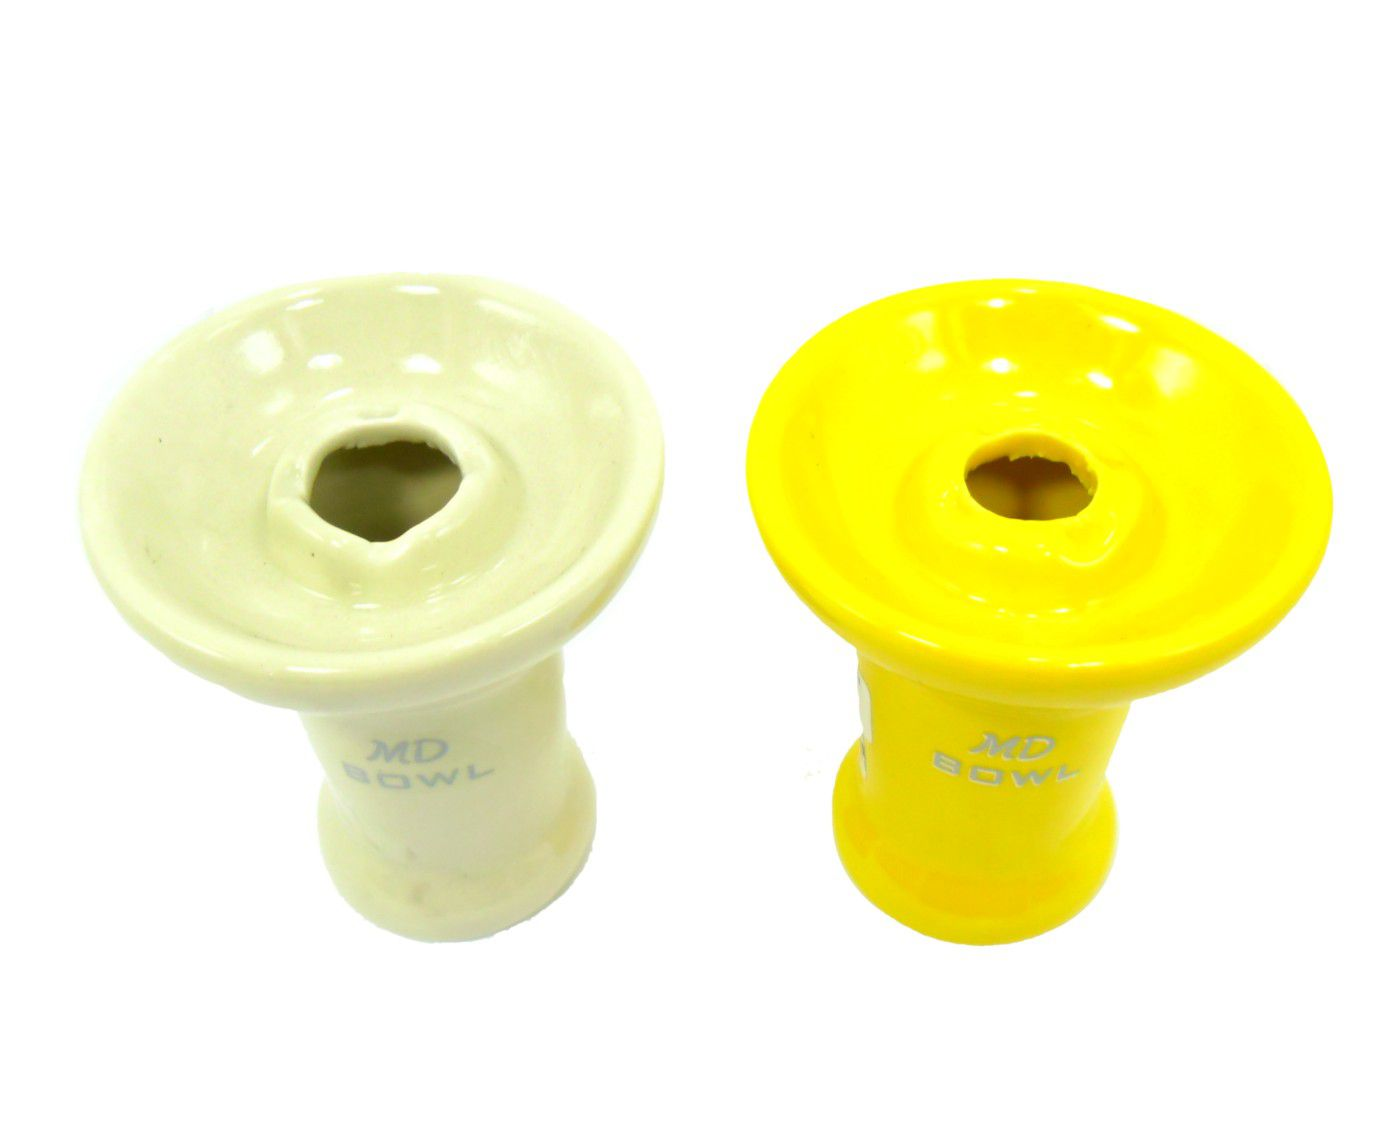 Fornilho/Rosh para narguile MD Prime. 8,5cm alt, 7,5cm cuba.